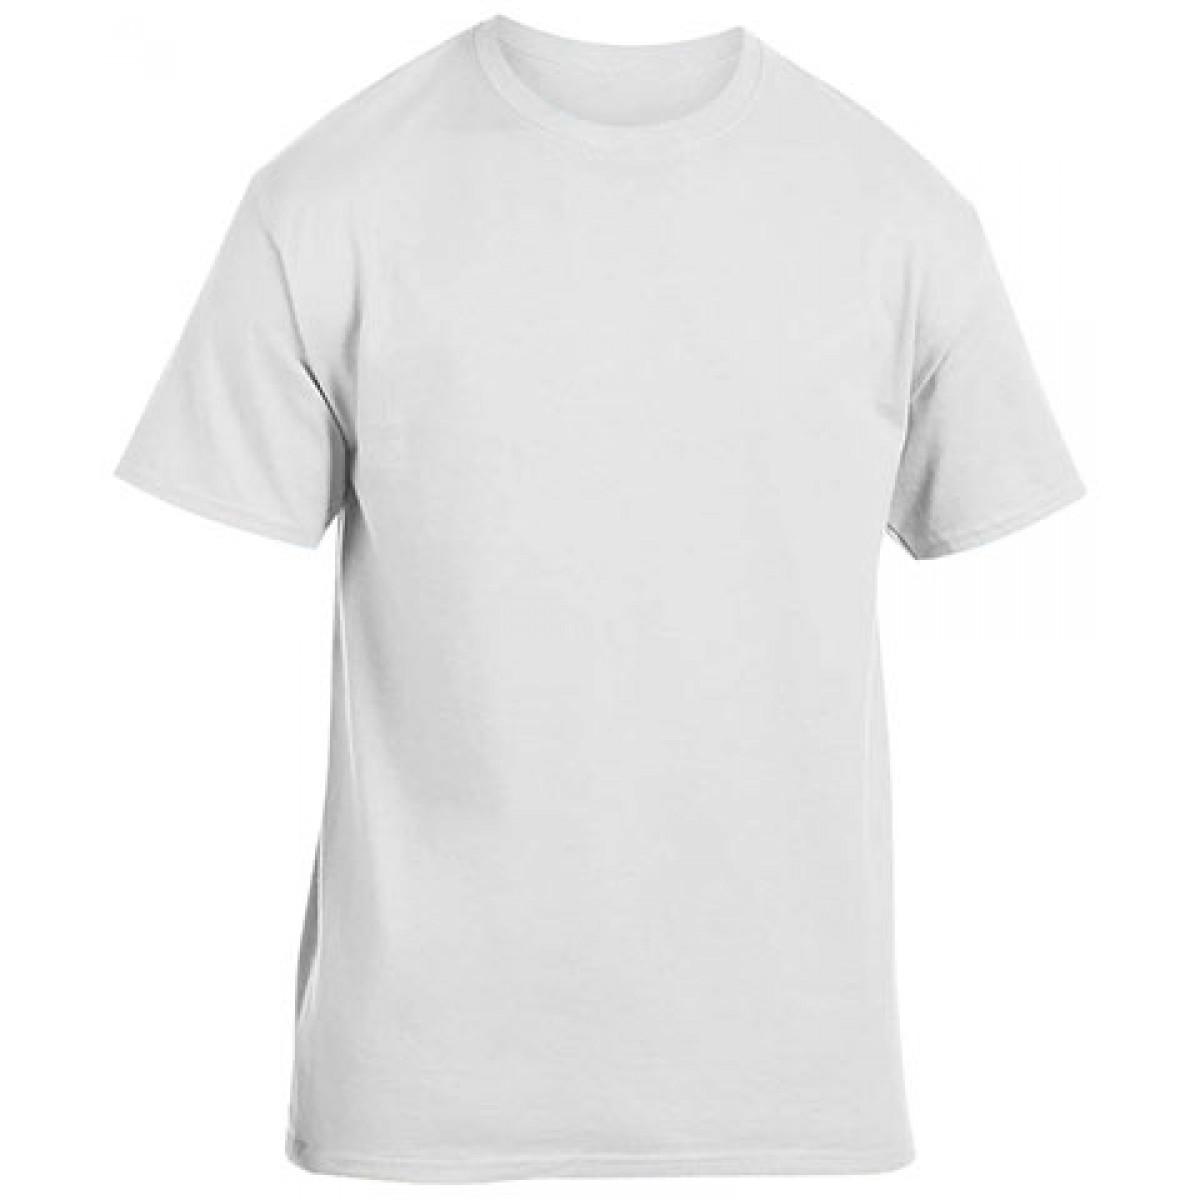 Cotton Short Sleeve T-Shirt-White-XXL